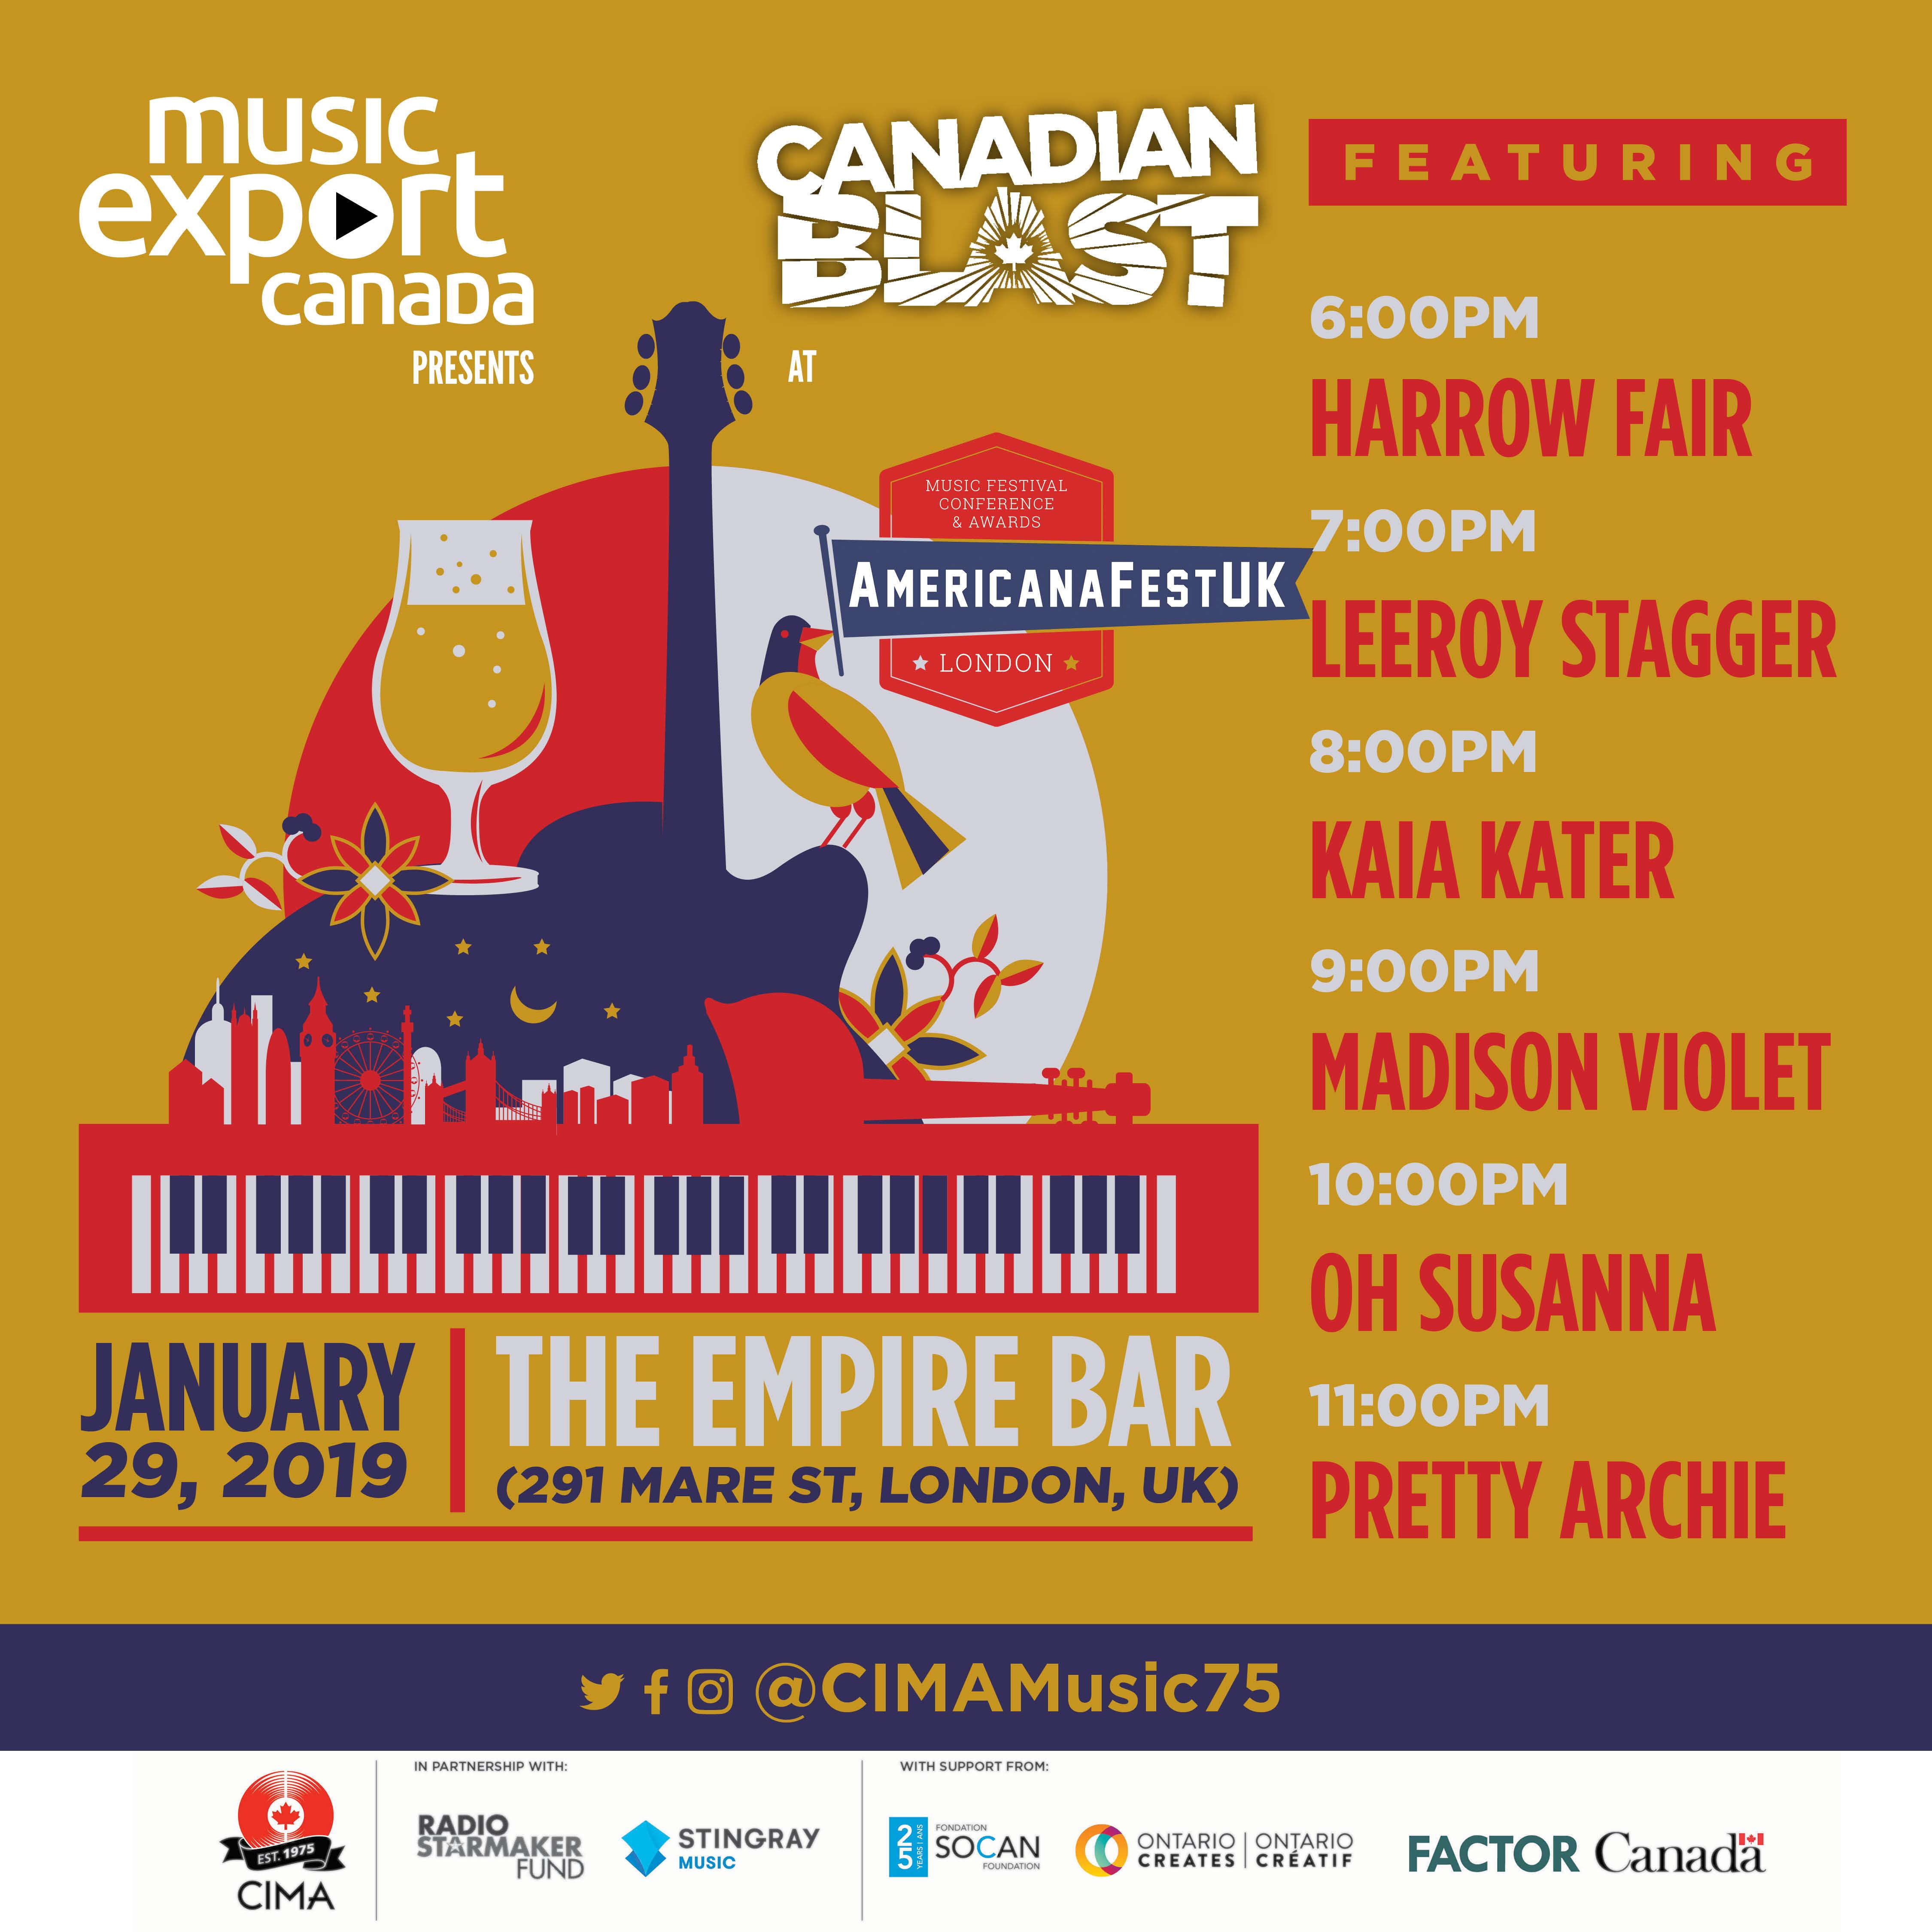 Music Export Canada Presents Americanafest Uk In January 2019